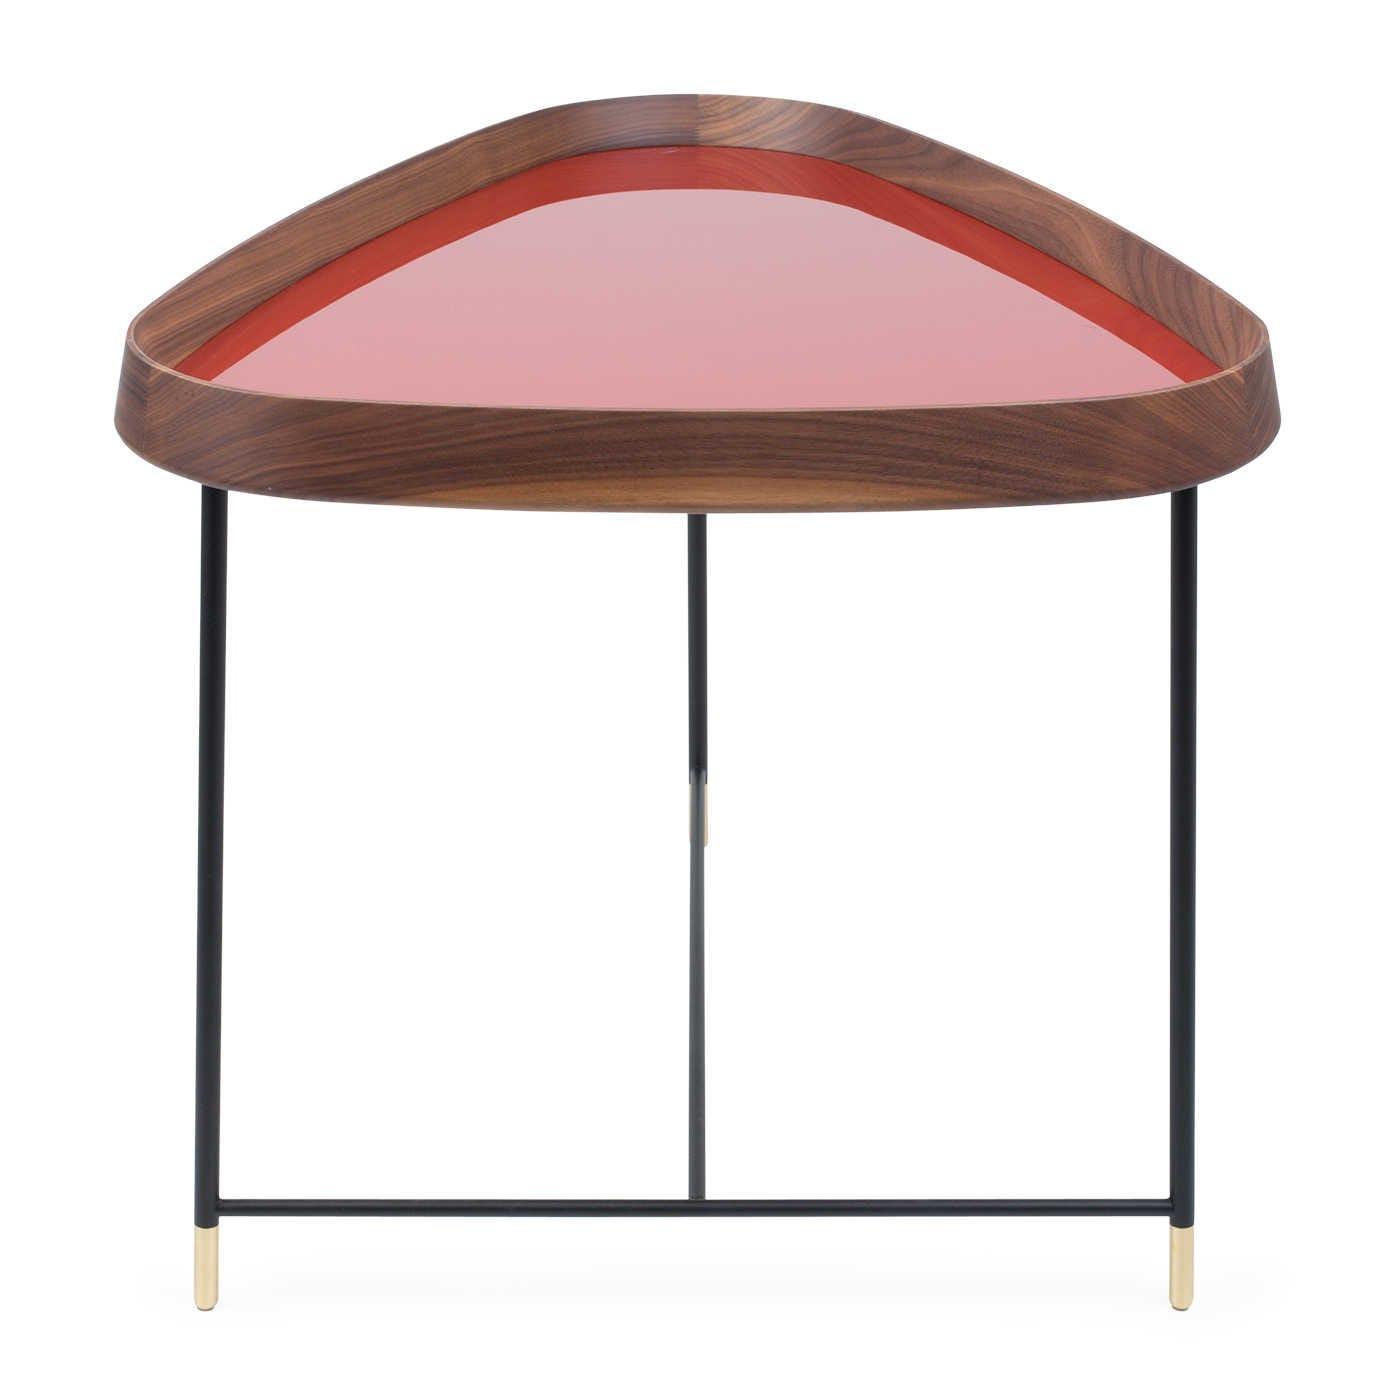 Porada Fritz 3 Triangular Side Table Walnut Granata Red Gloss Lacquer